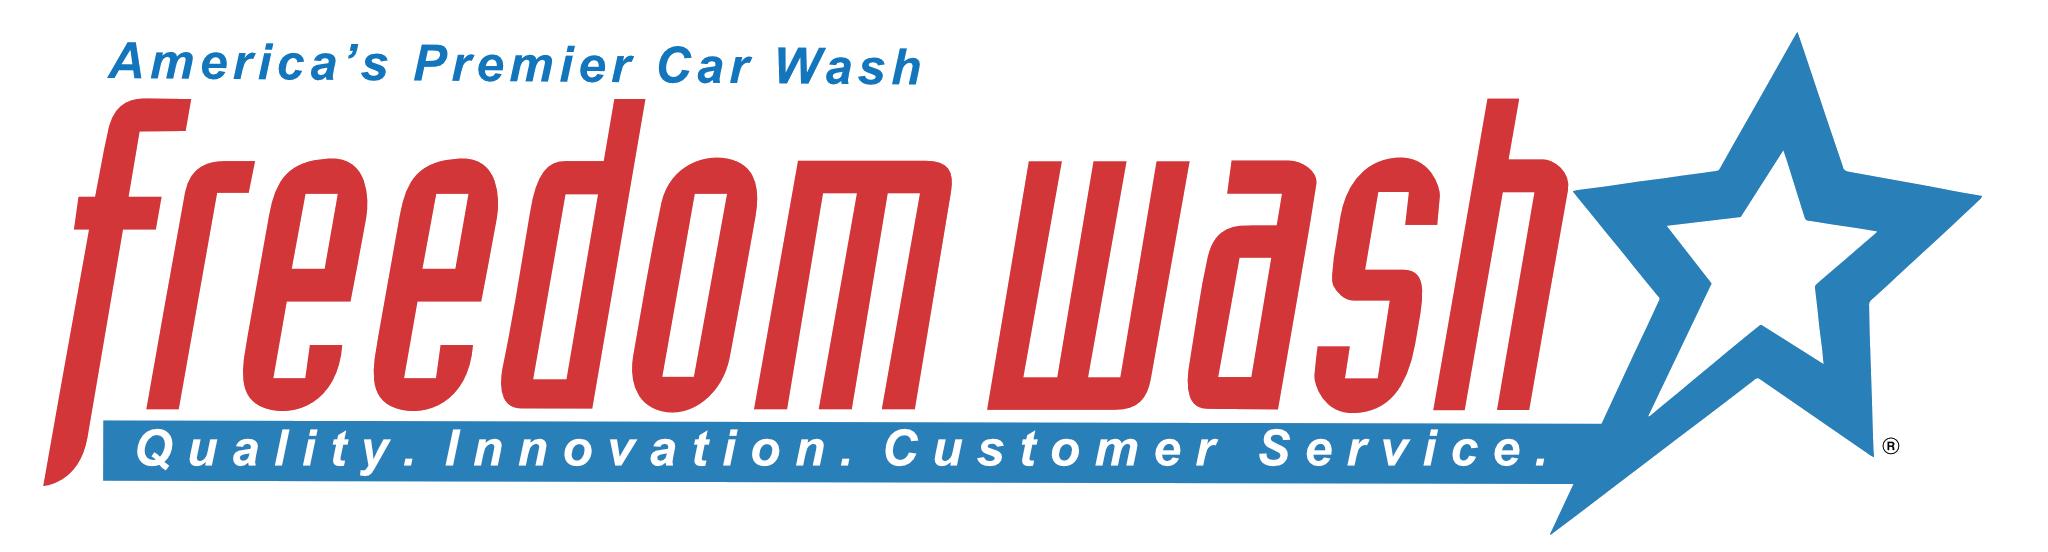 America's Premier Car Wash